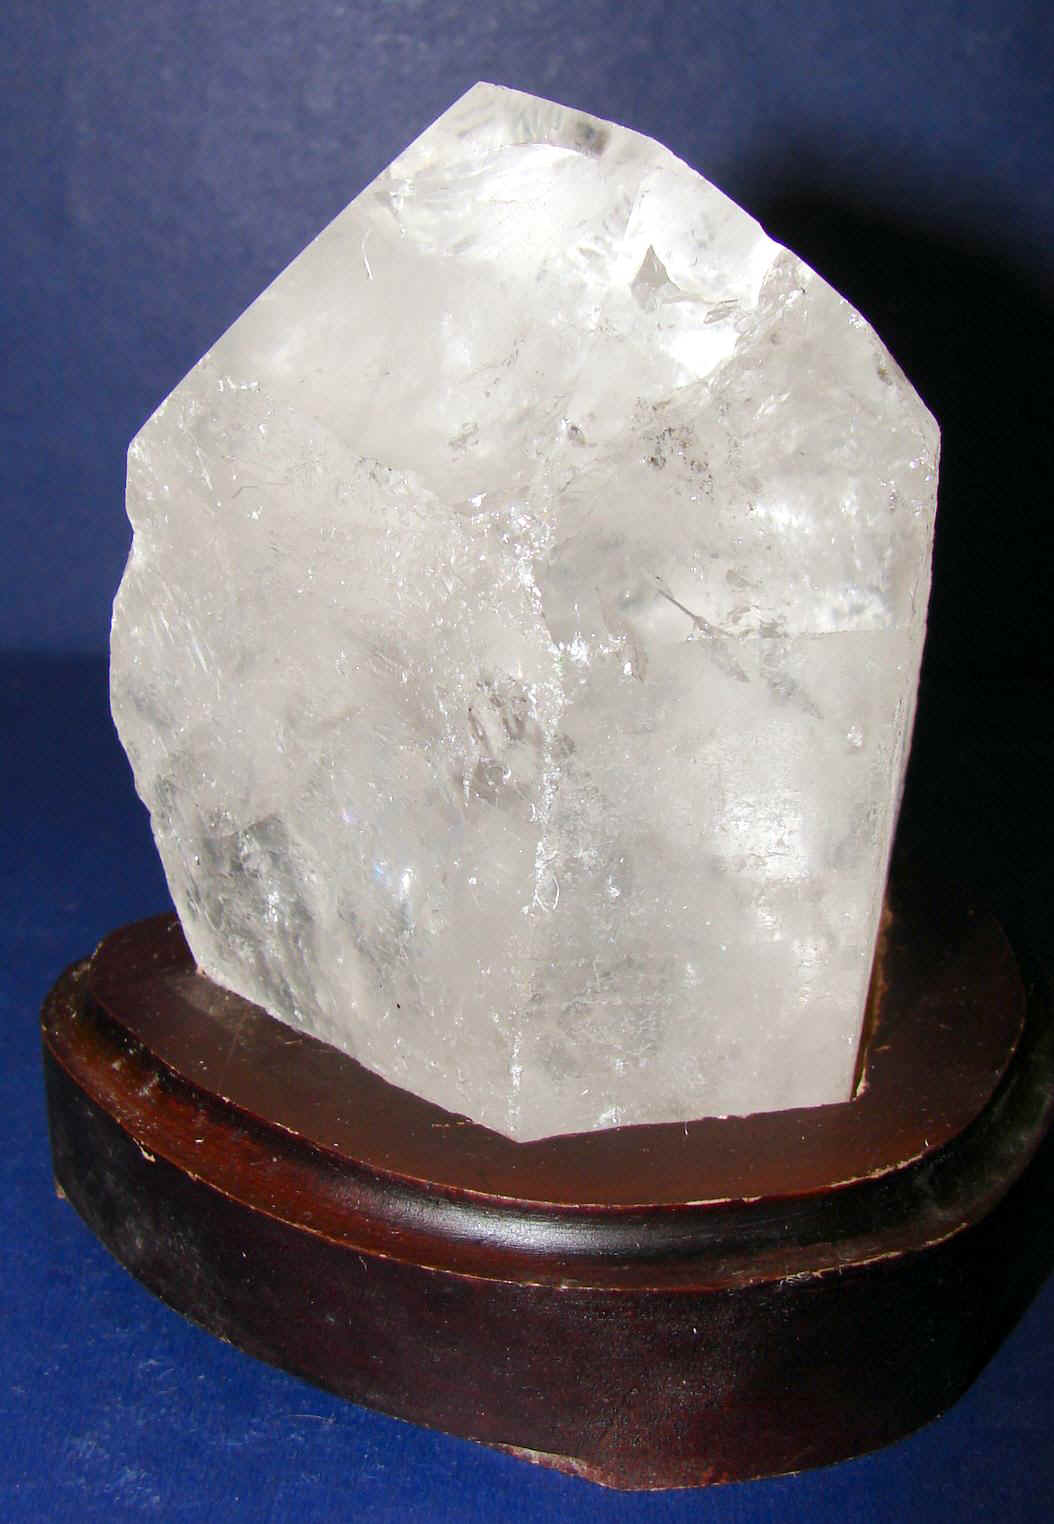 http://www.quartzcrystals.net/woodxl-1.jpg (582341 bytes)